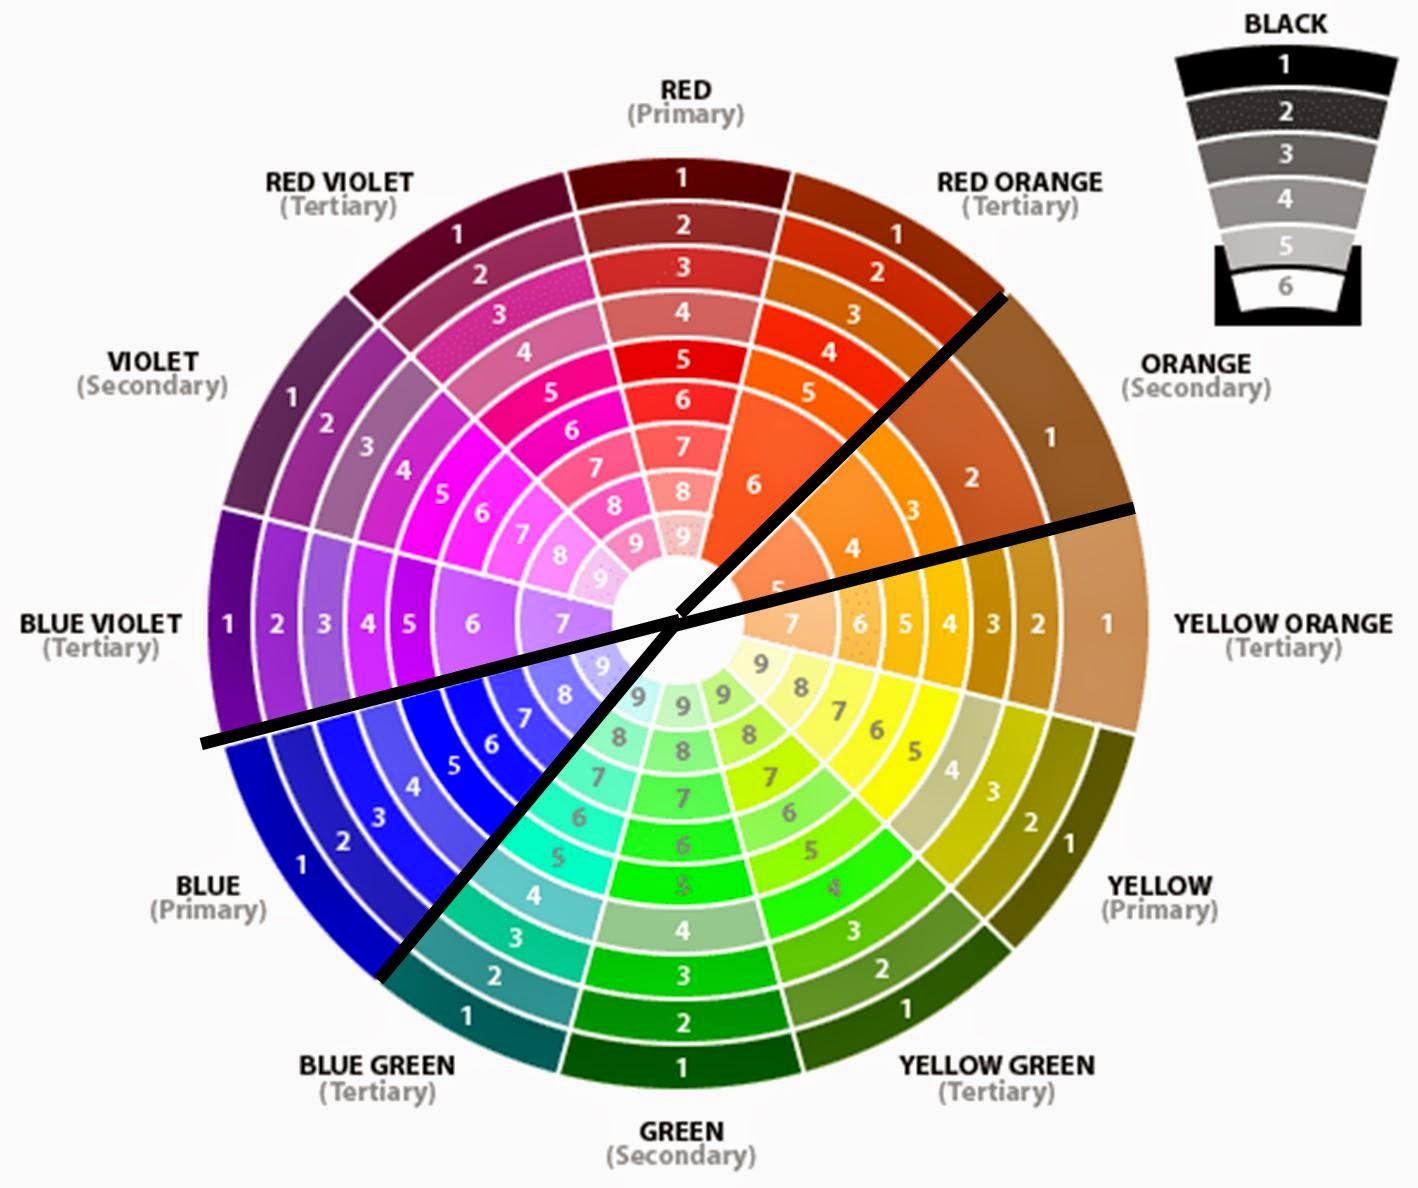 Off The Rails Scrapbooking Using A Colour Wheel Part 1